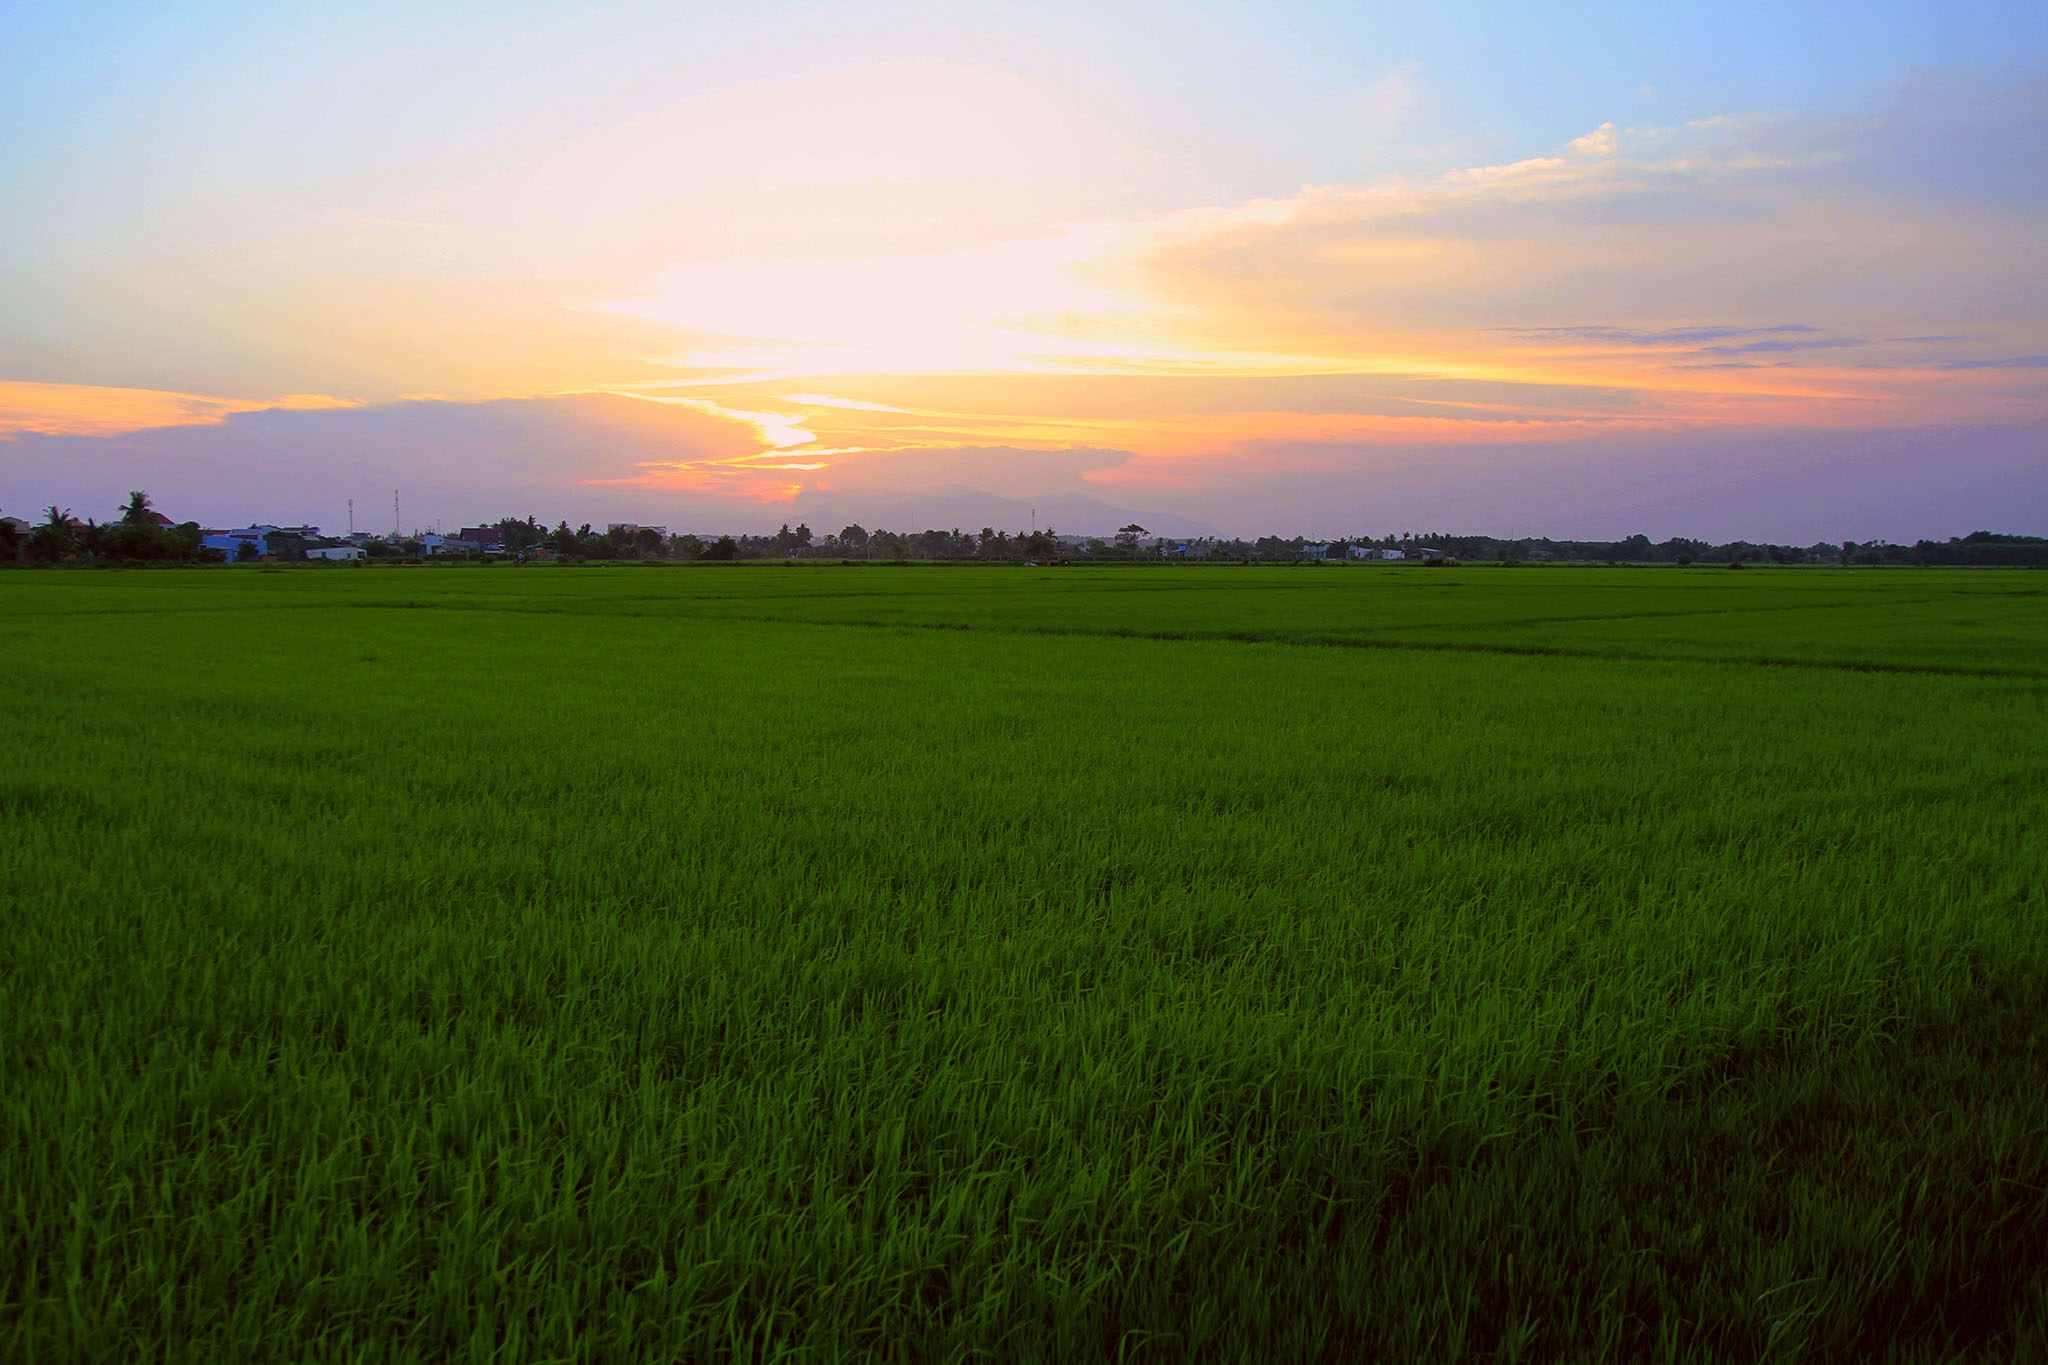 Sunset on the field by binhhtphoto